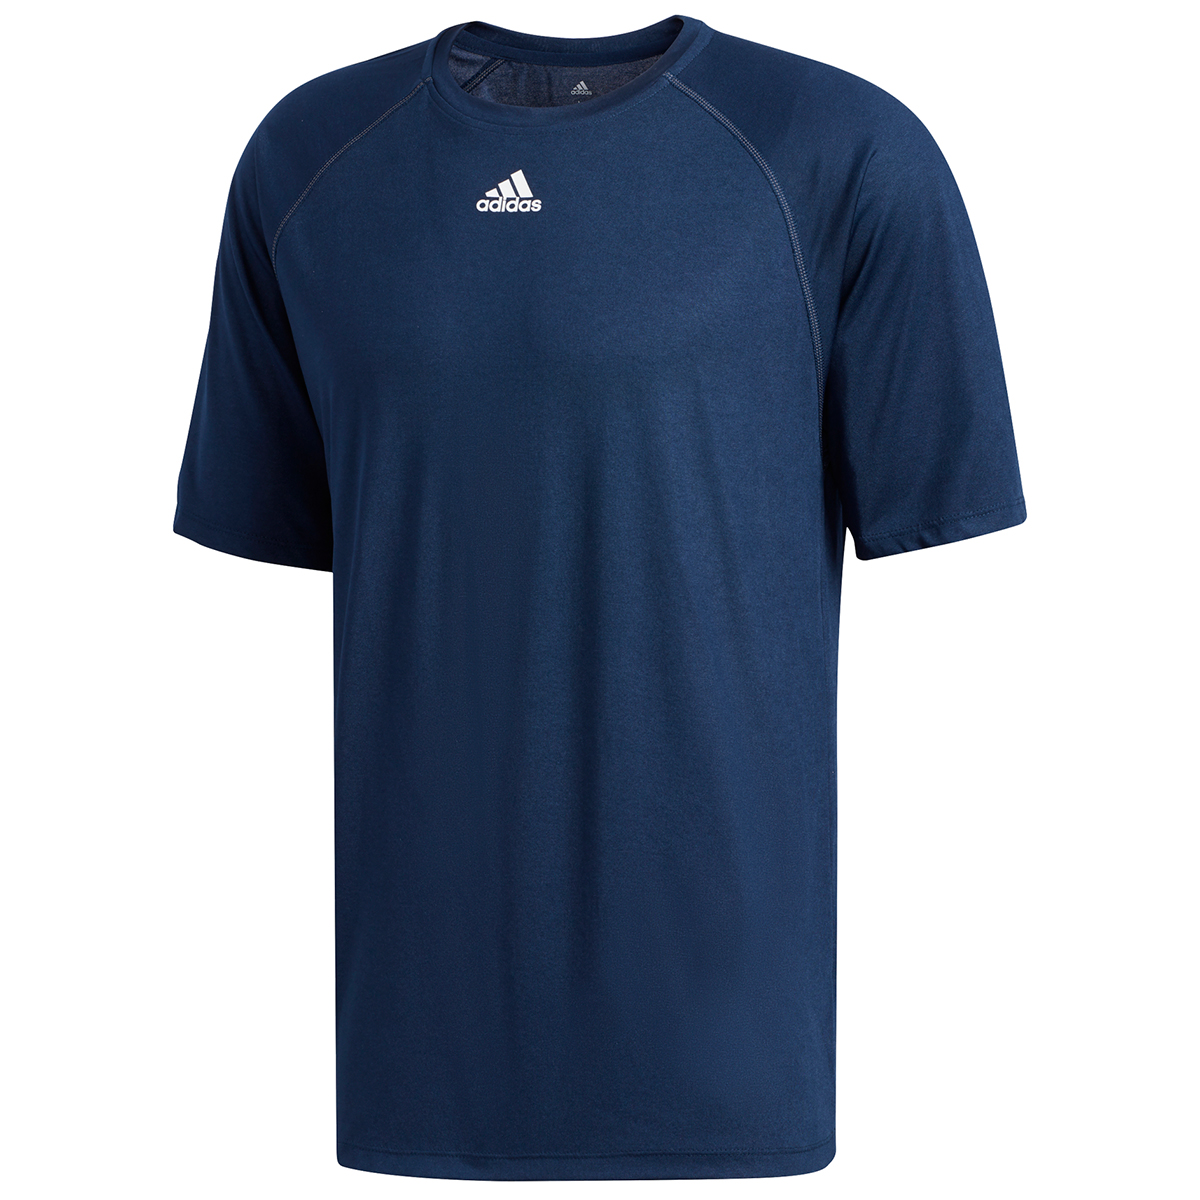 Adidas Men's Climalite Short-Sleeve Tee - Blue, 4XL